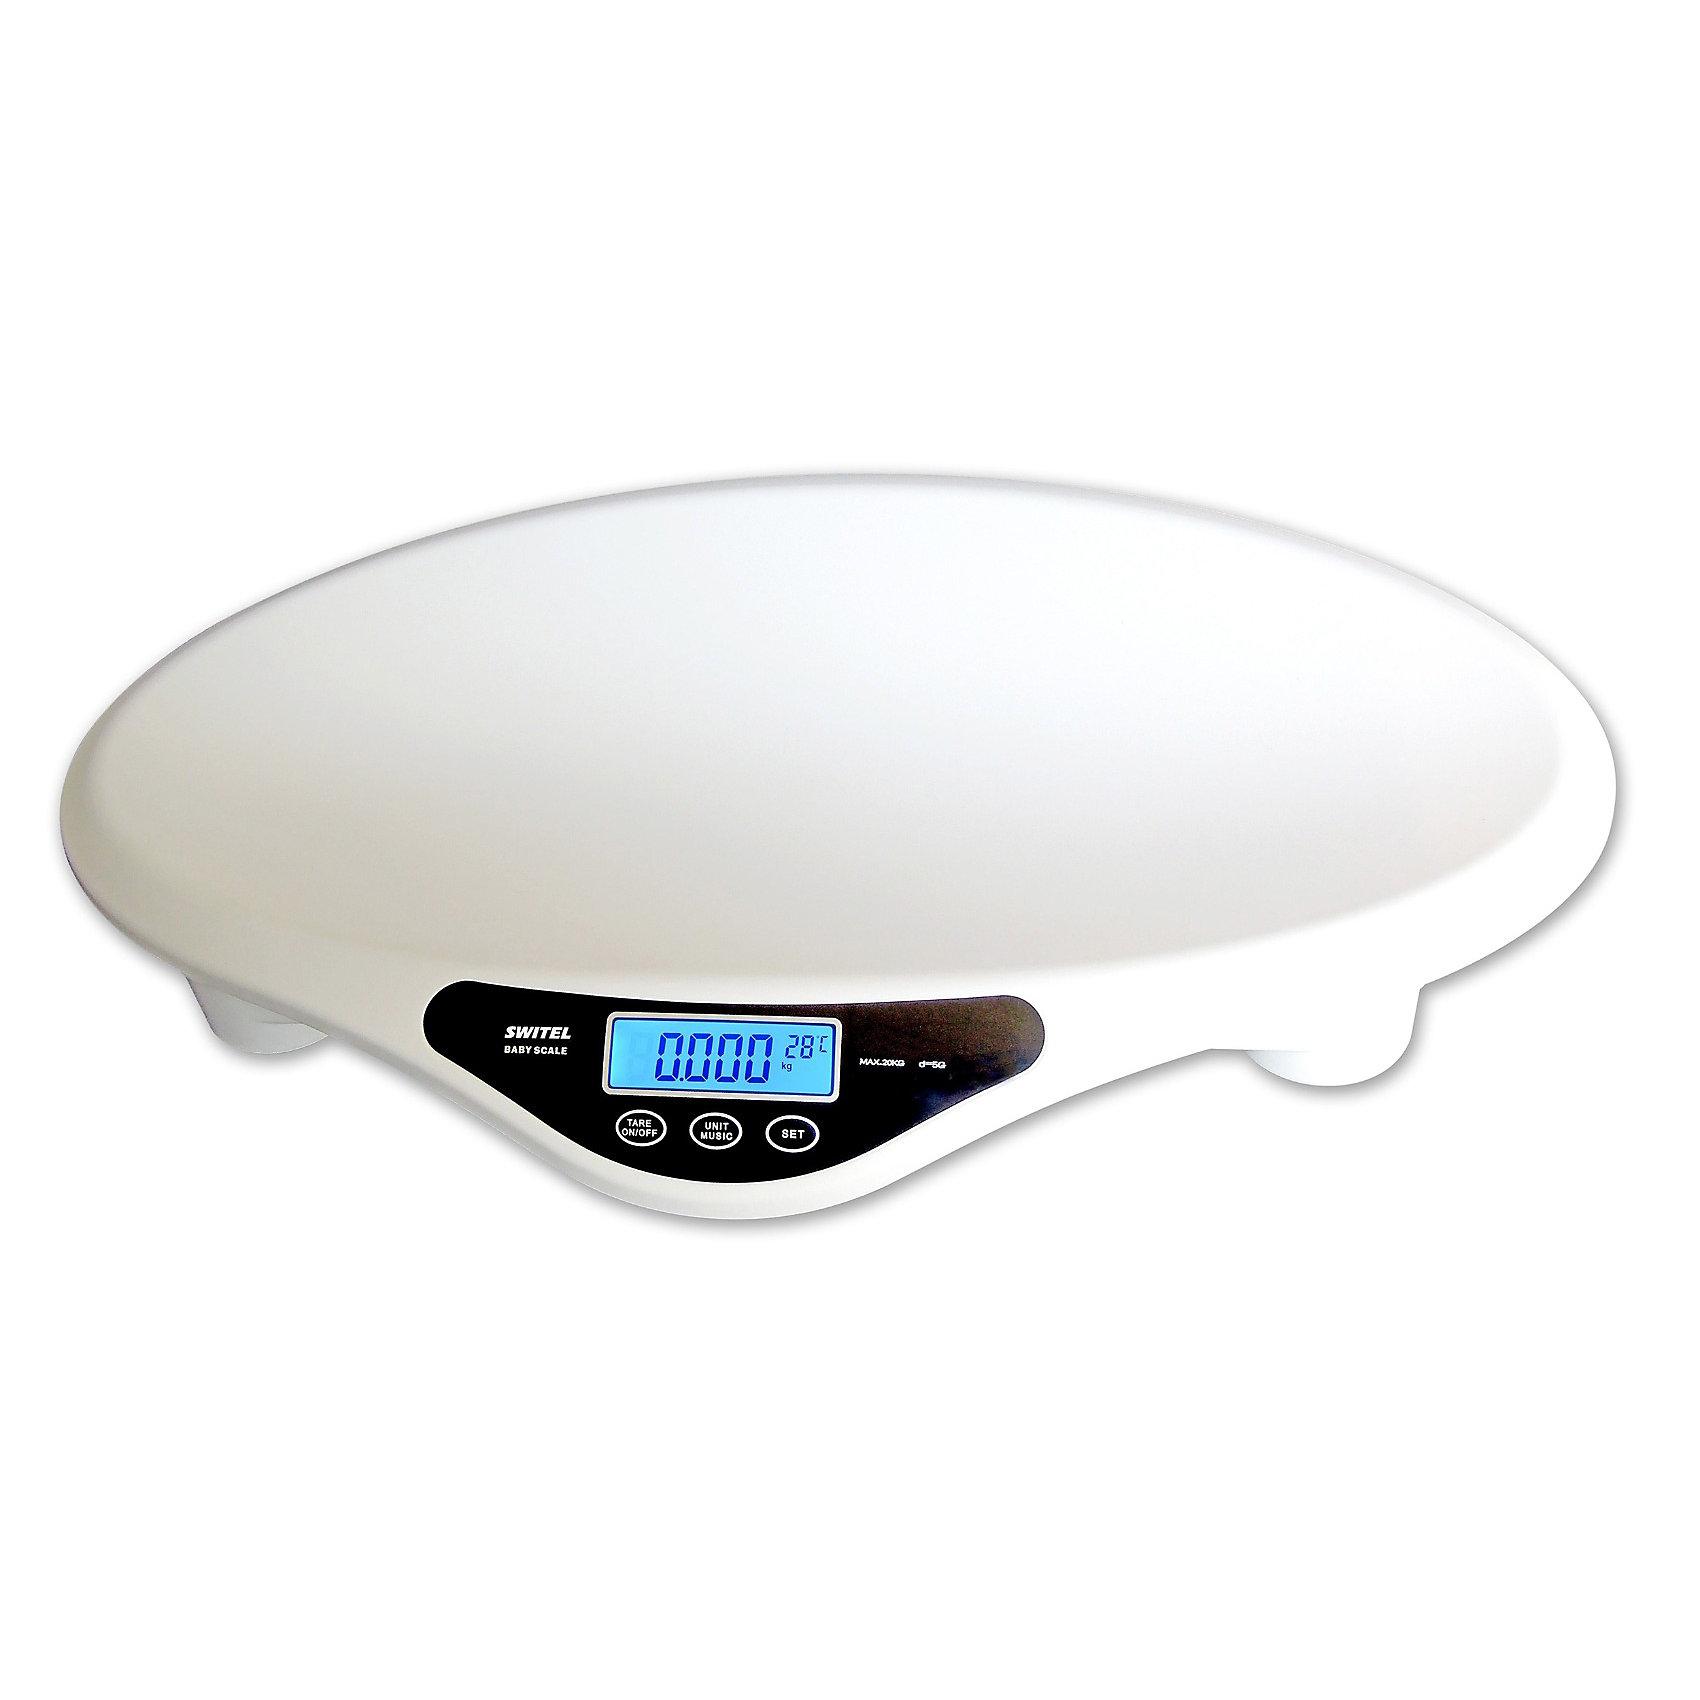 SWITEL Детские электронные весы BH700, Switel switel рация switel wte2313 с функцией радионяни